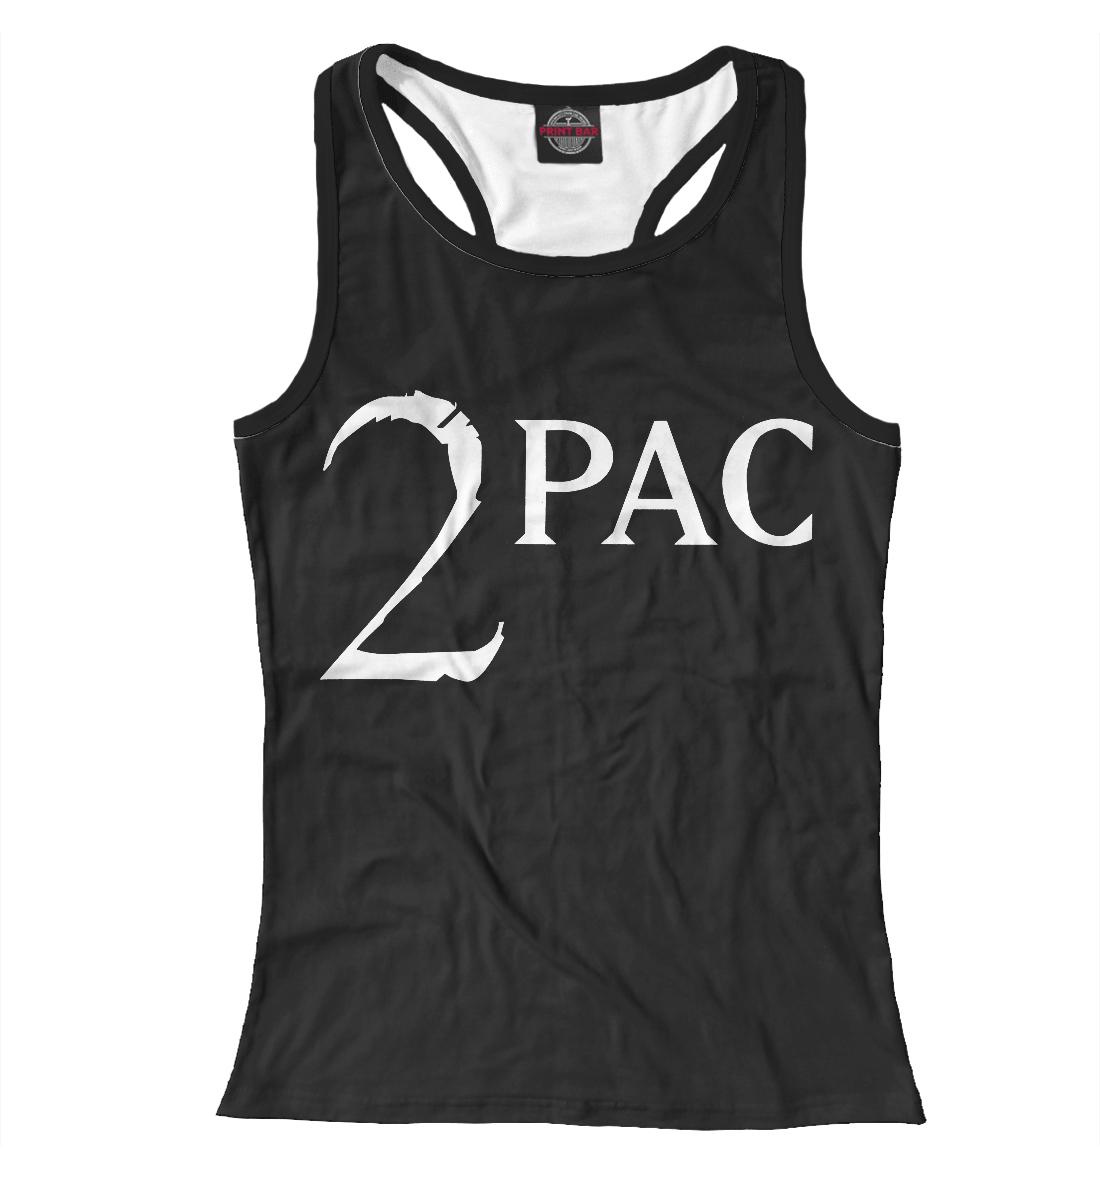 Купить 2Pac, Printbar, Майки борцовки, 2PA-835532-mayb-1